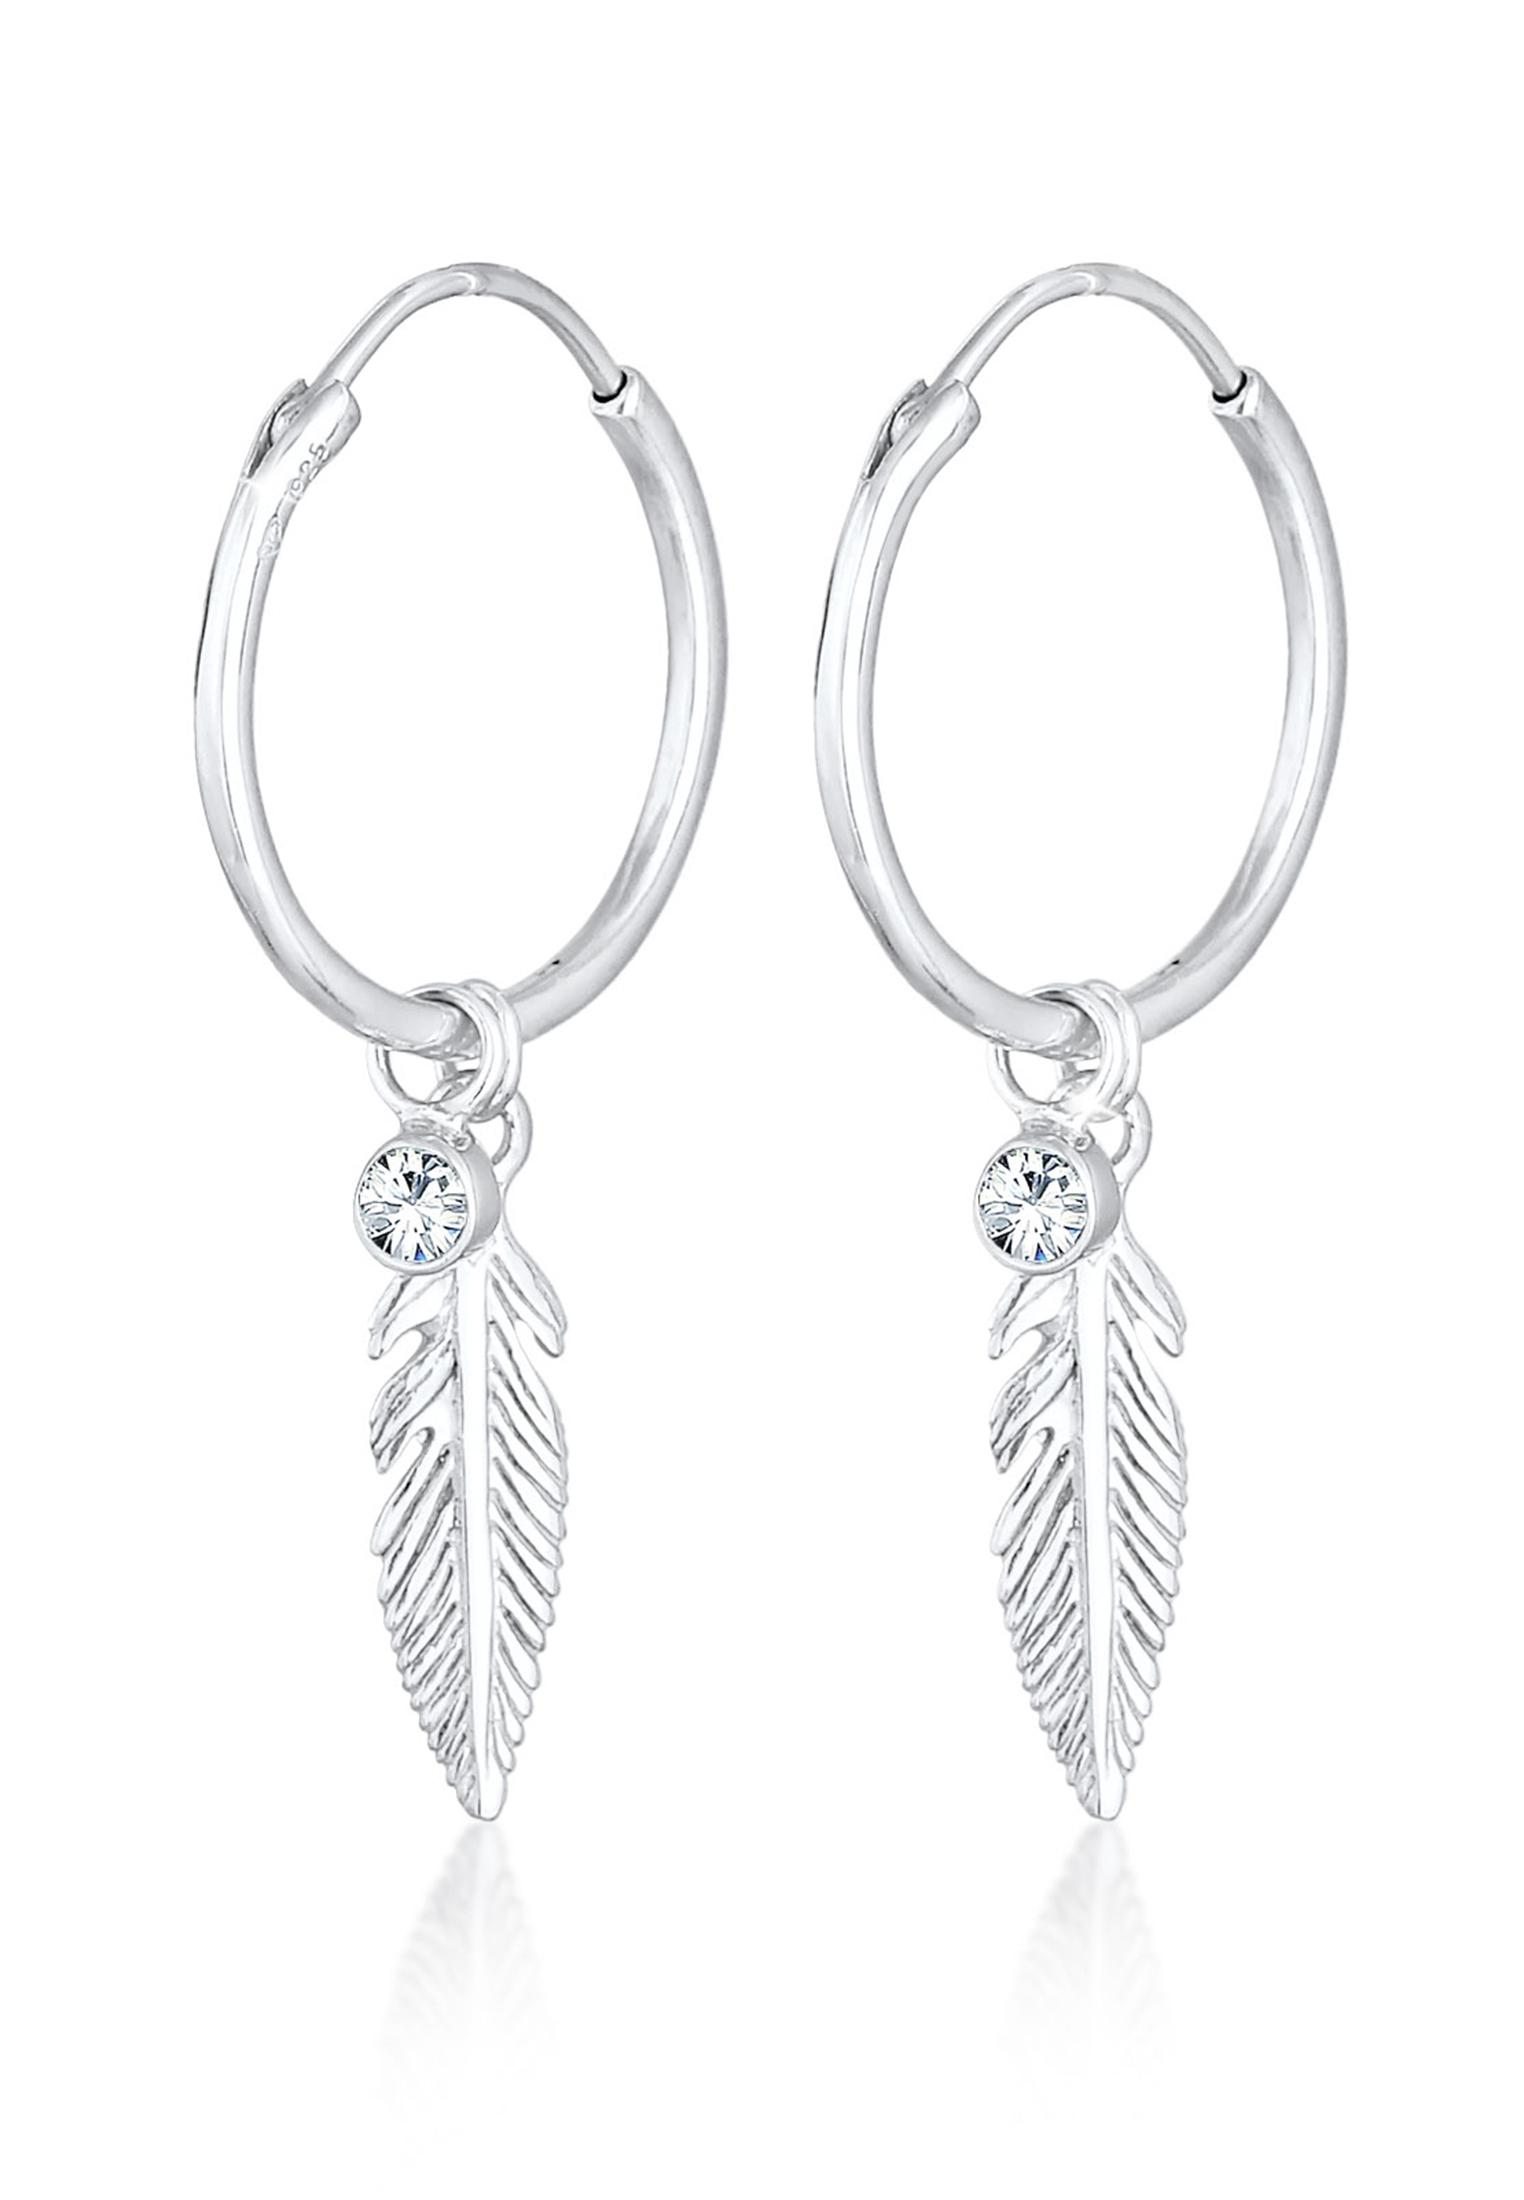 Creole Feder | Kristall ( Weiß ) | 925er Sterling Silber